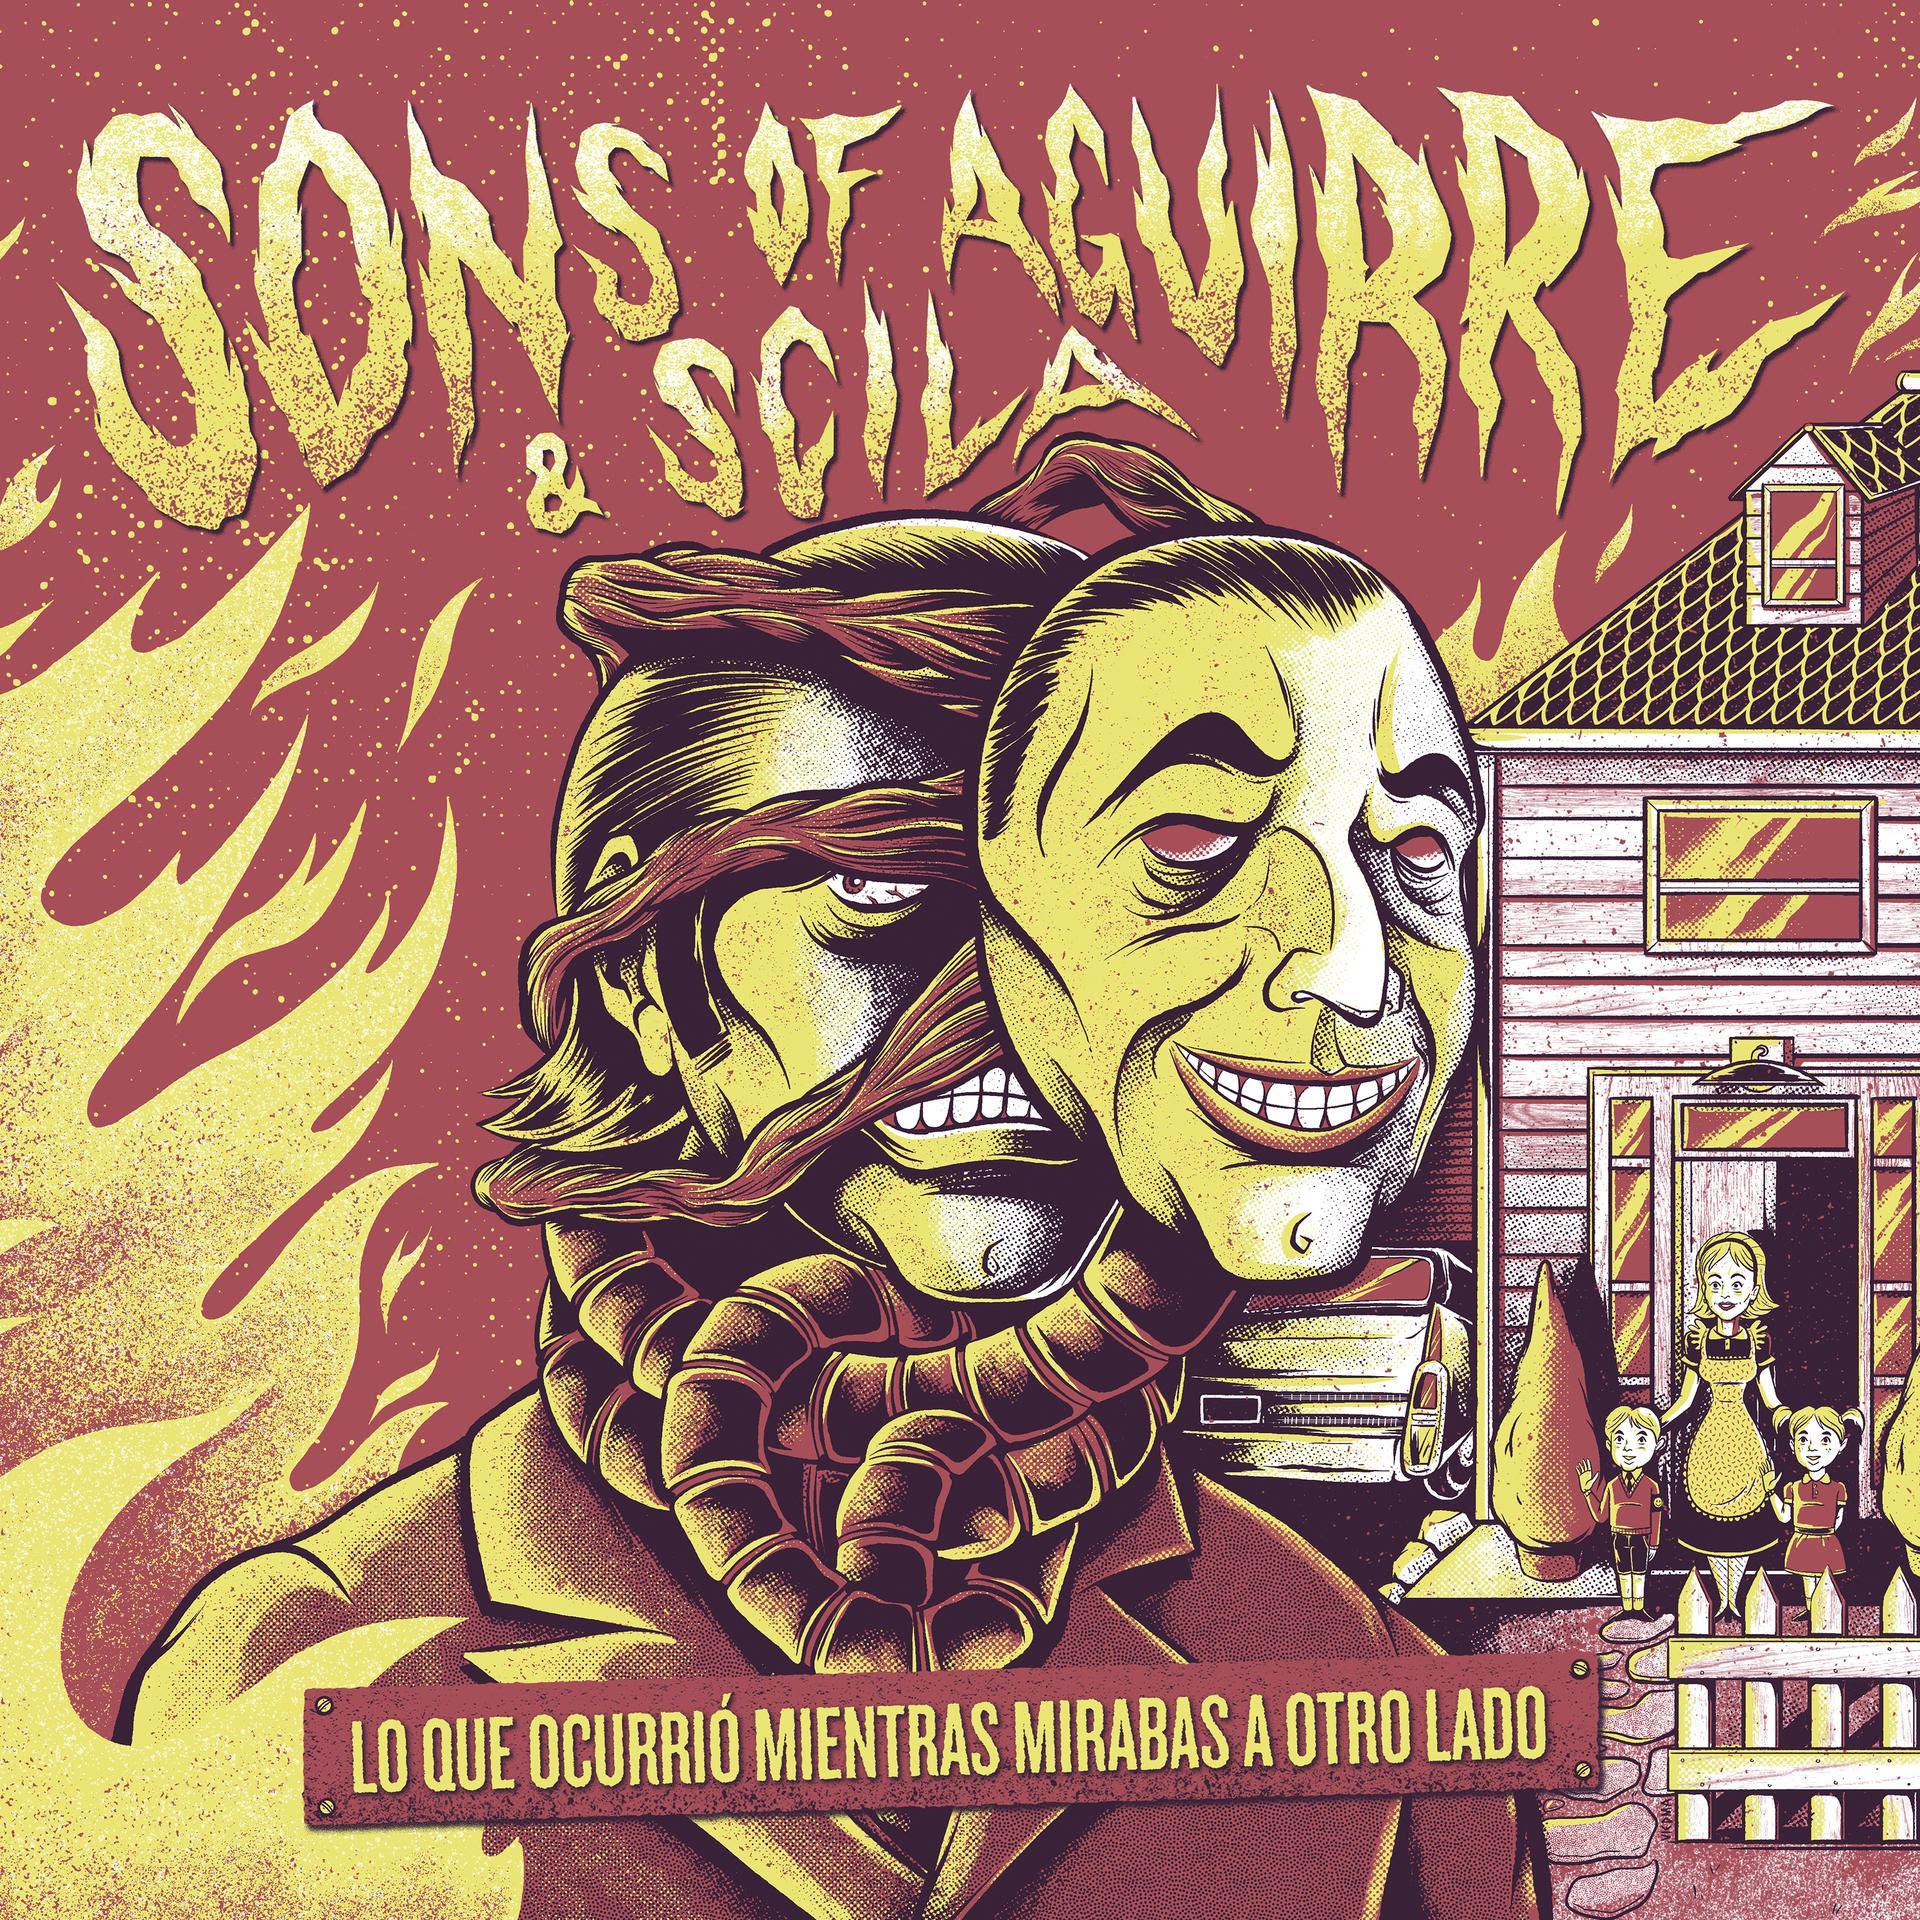 SONS OF AGUIRRE & SCILA – Gira presentación 2020 – Primeras fechas confirmadas